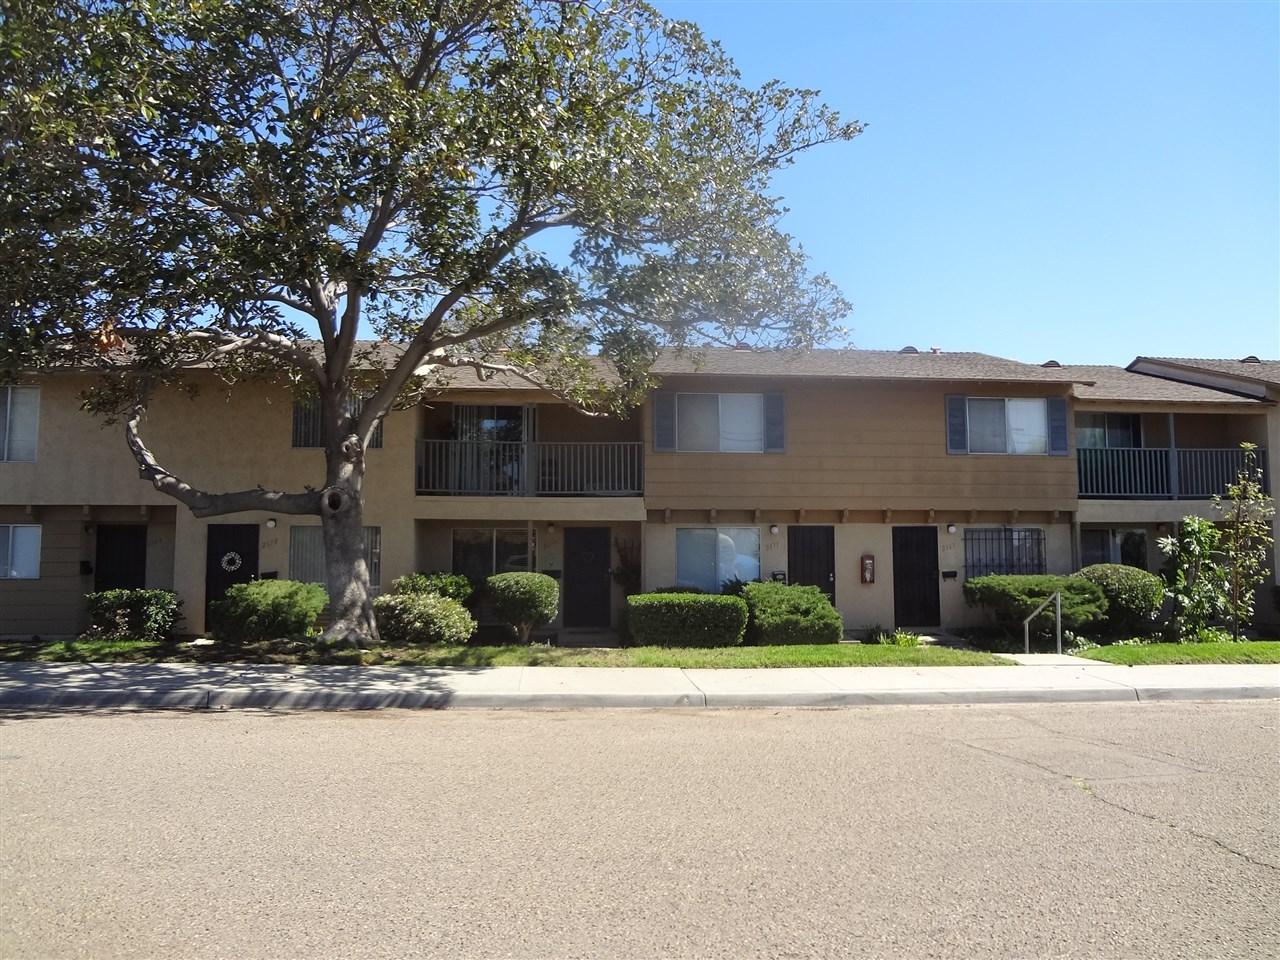 2175 Berry, Lemon Grove, CA 91945